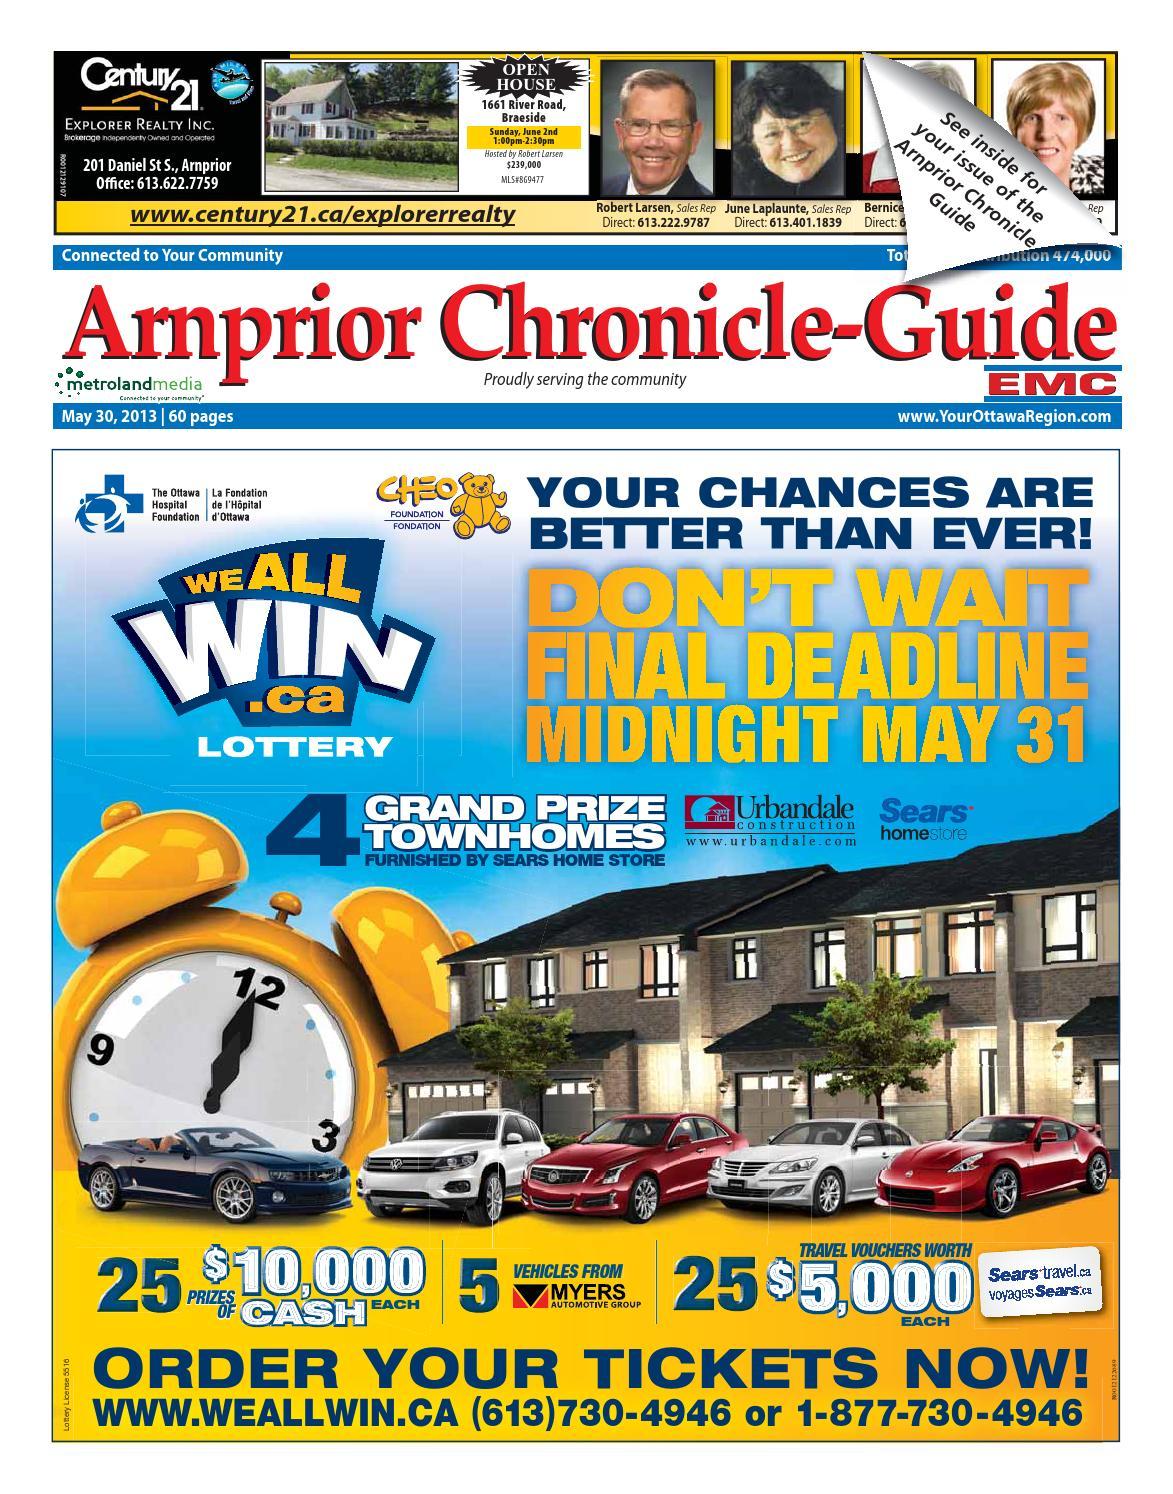 Arnprior053013 by Metroland East - Arnprior Chronicle-Guide - issuu